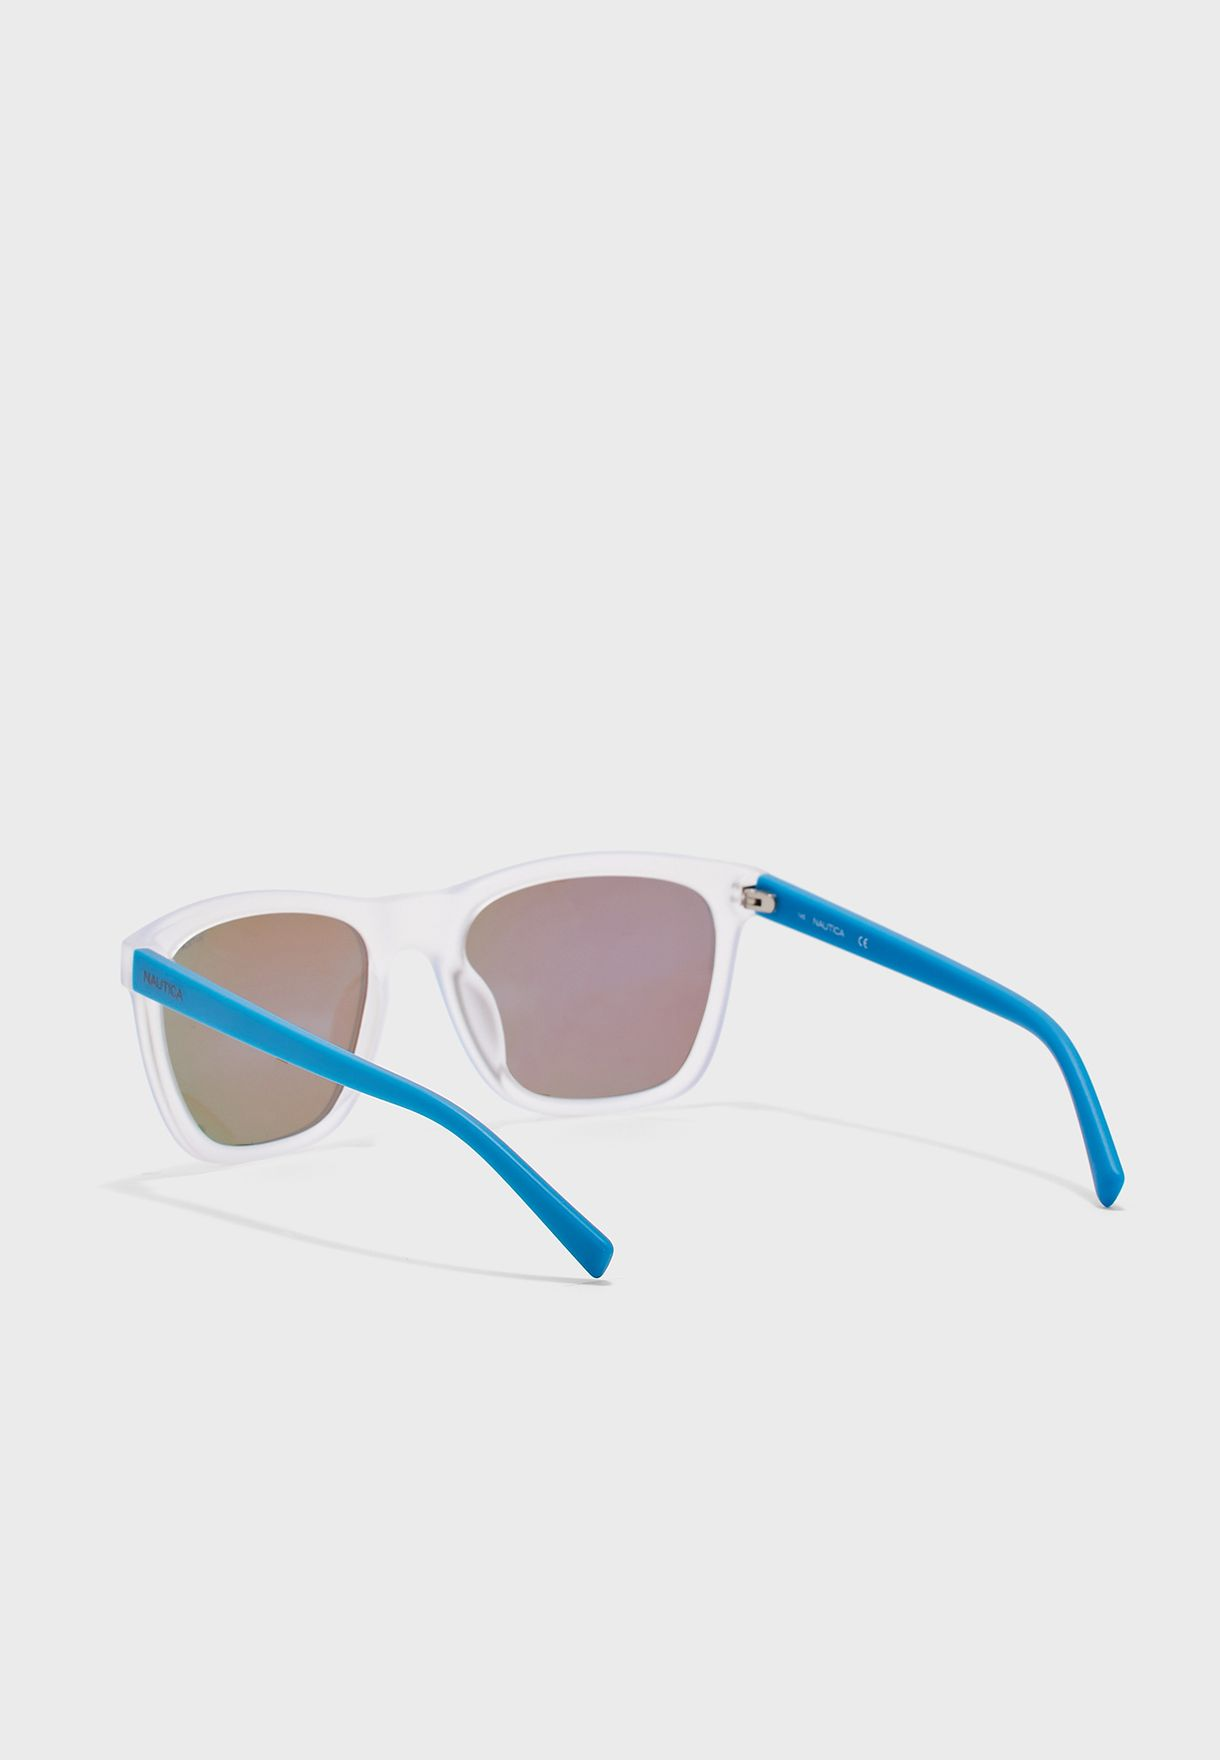 Polarized Square Wayfarer Sunglasses